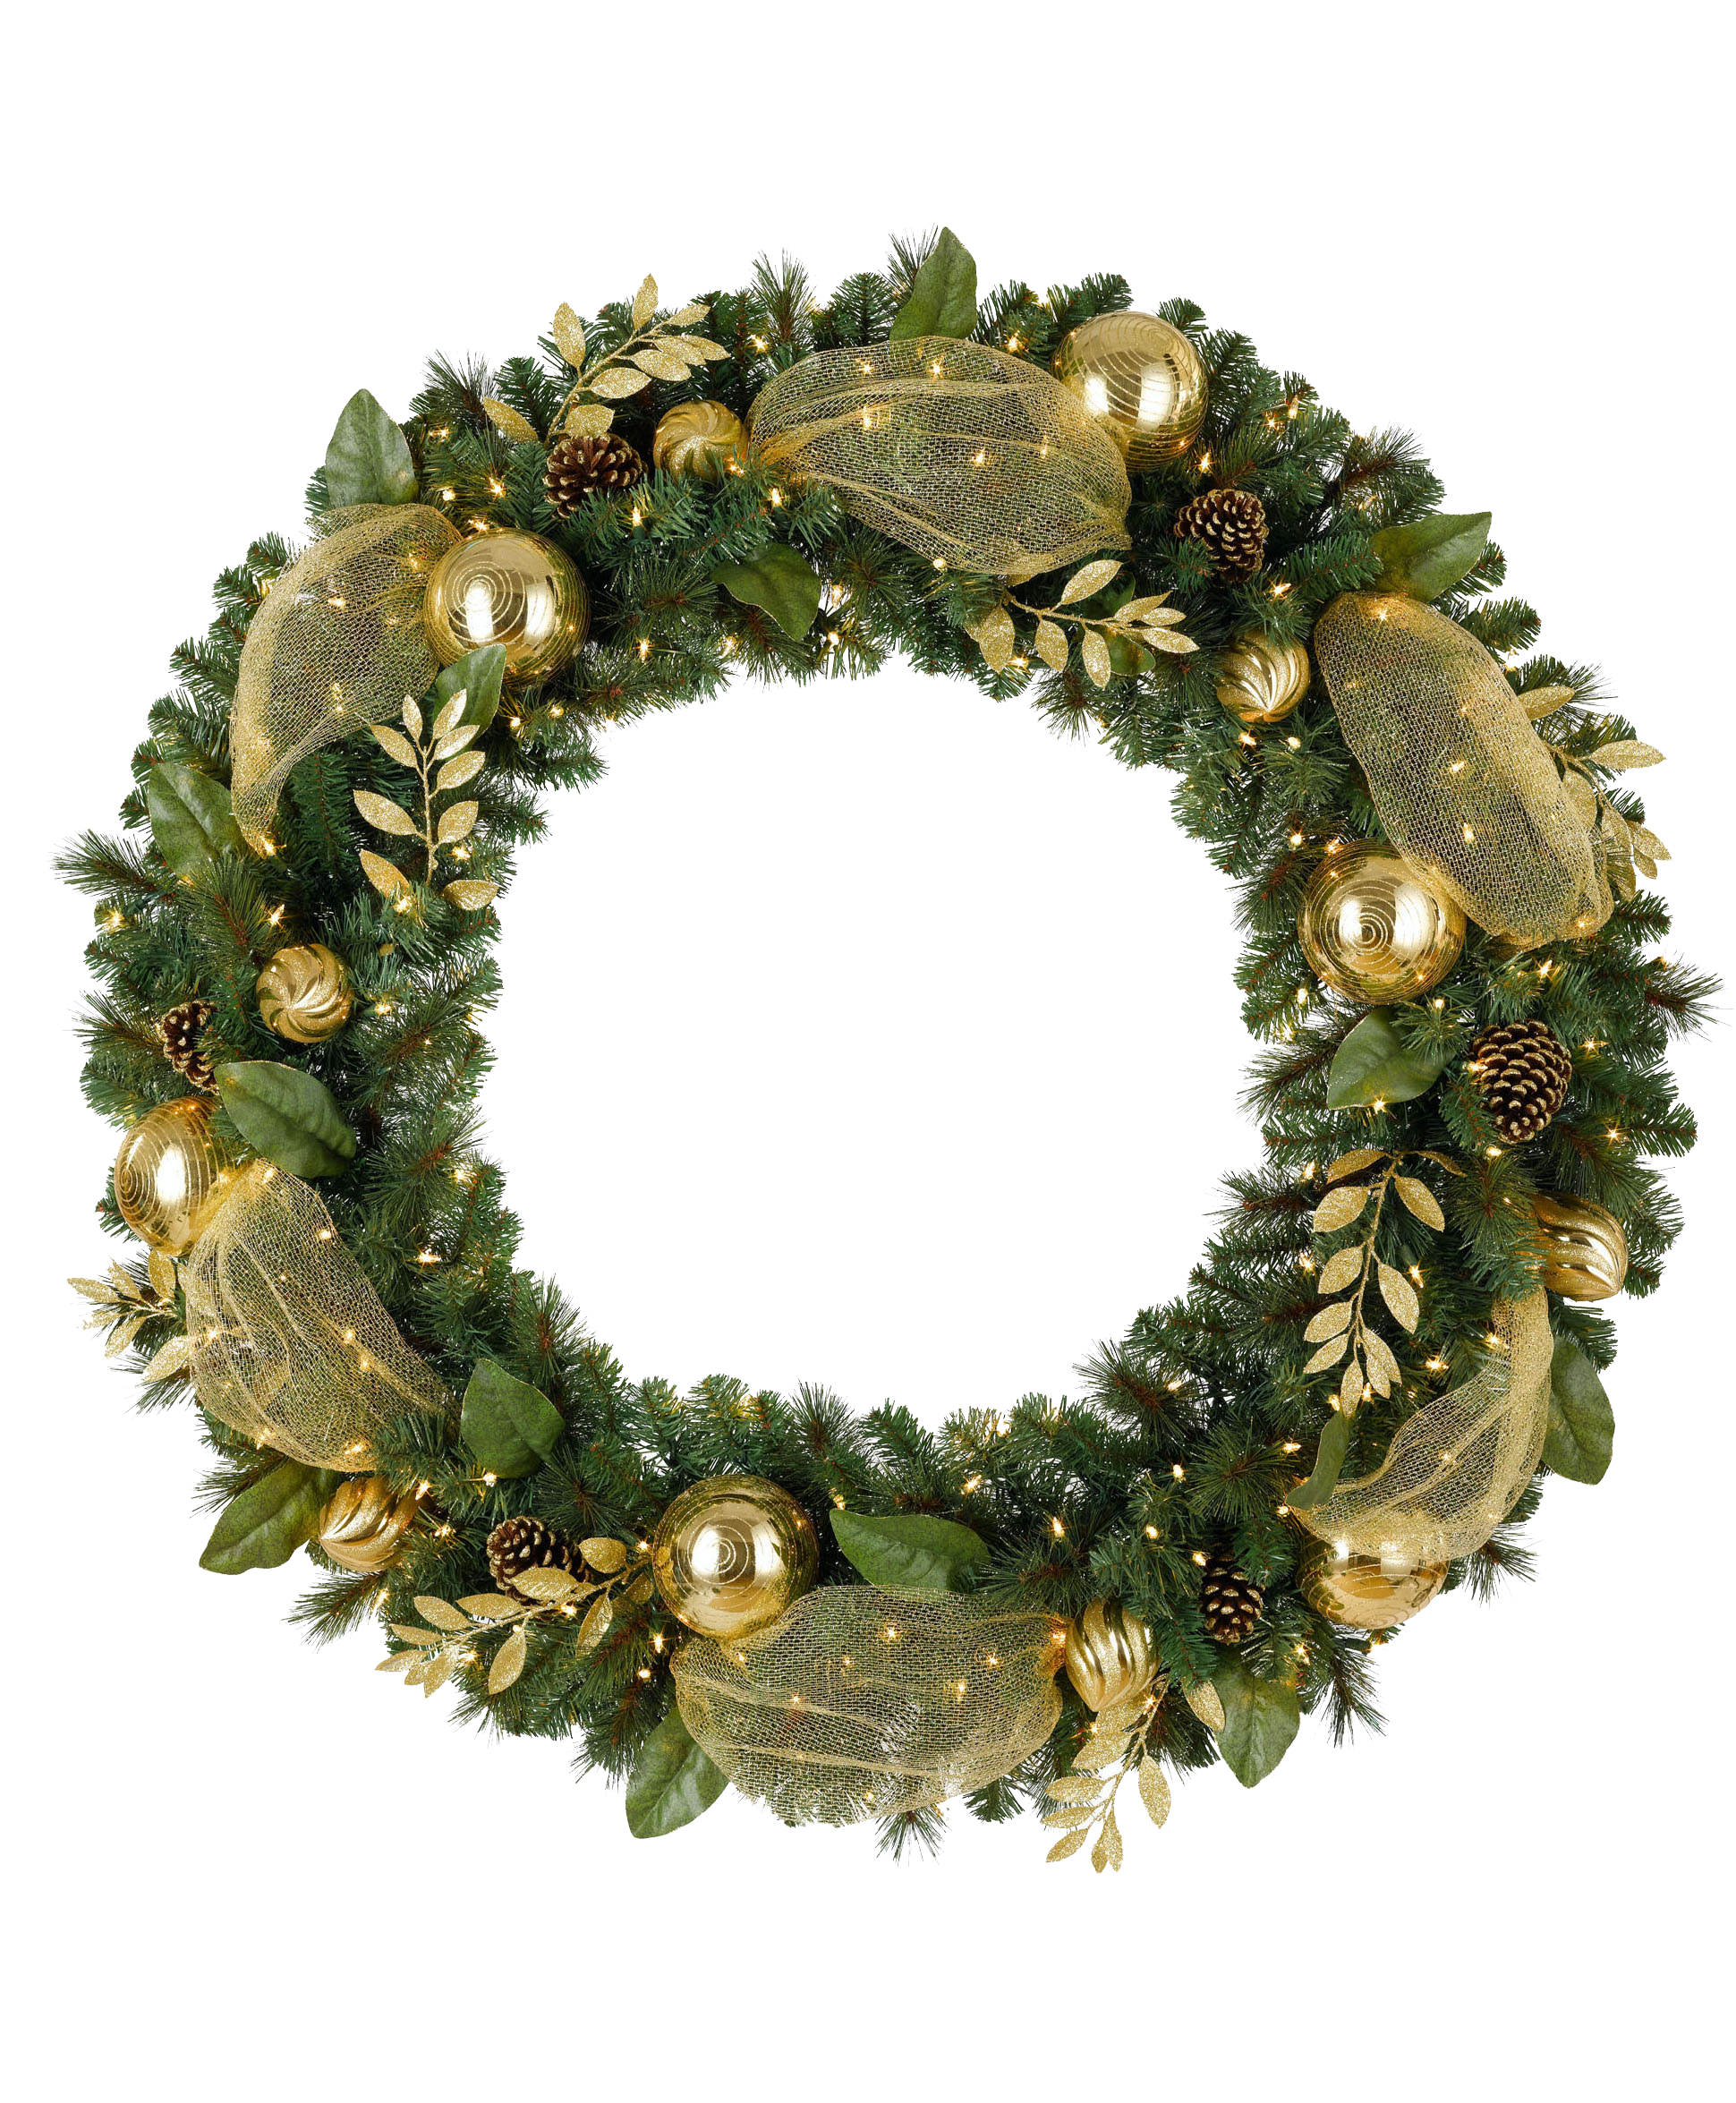 Free PNG HD Christmas Wreath - 126834